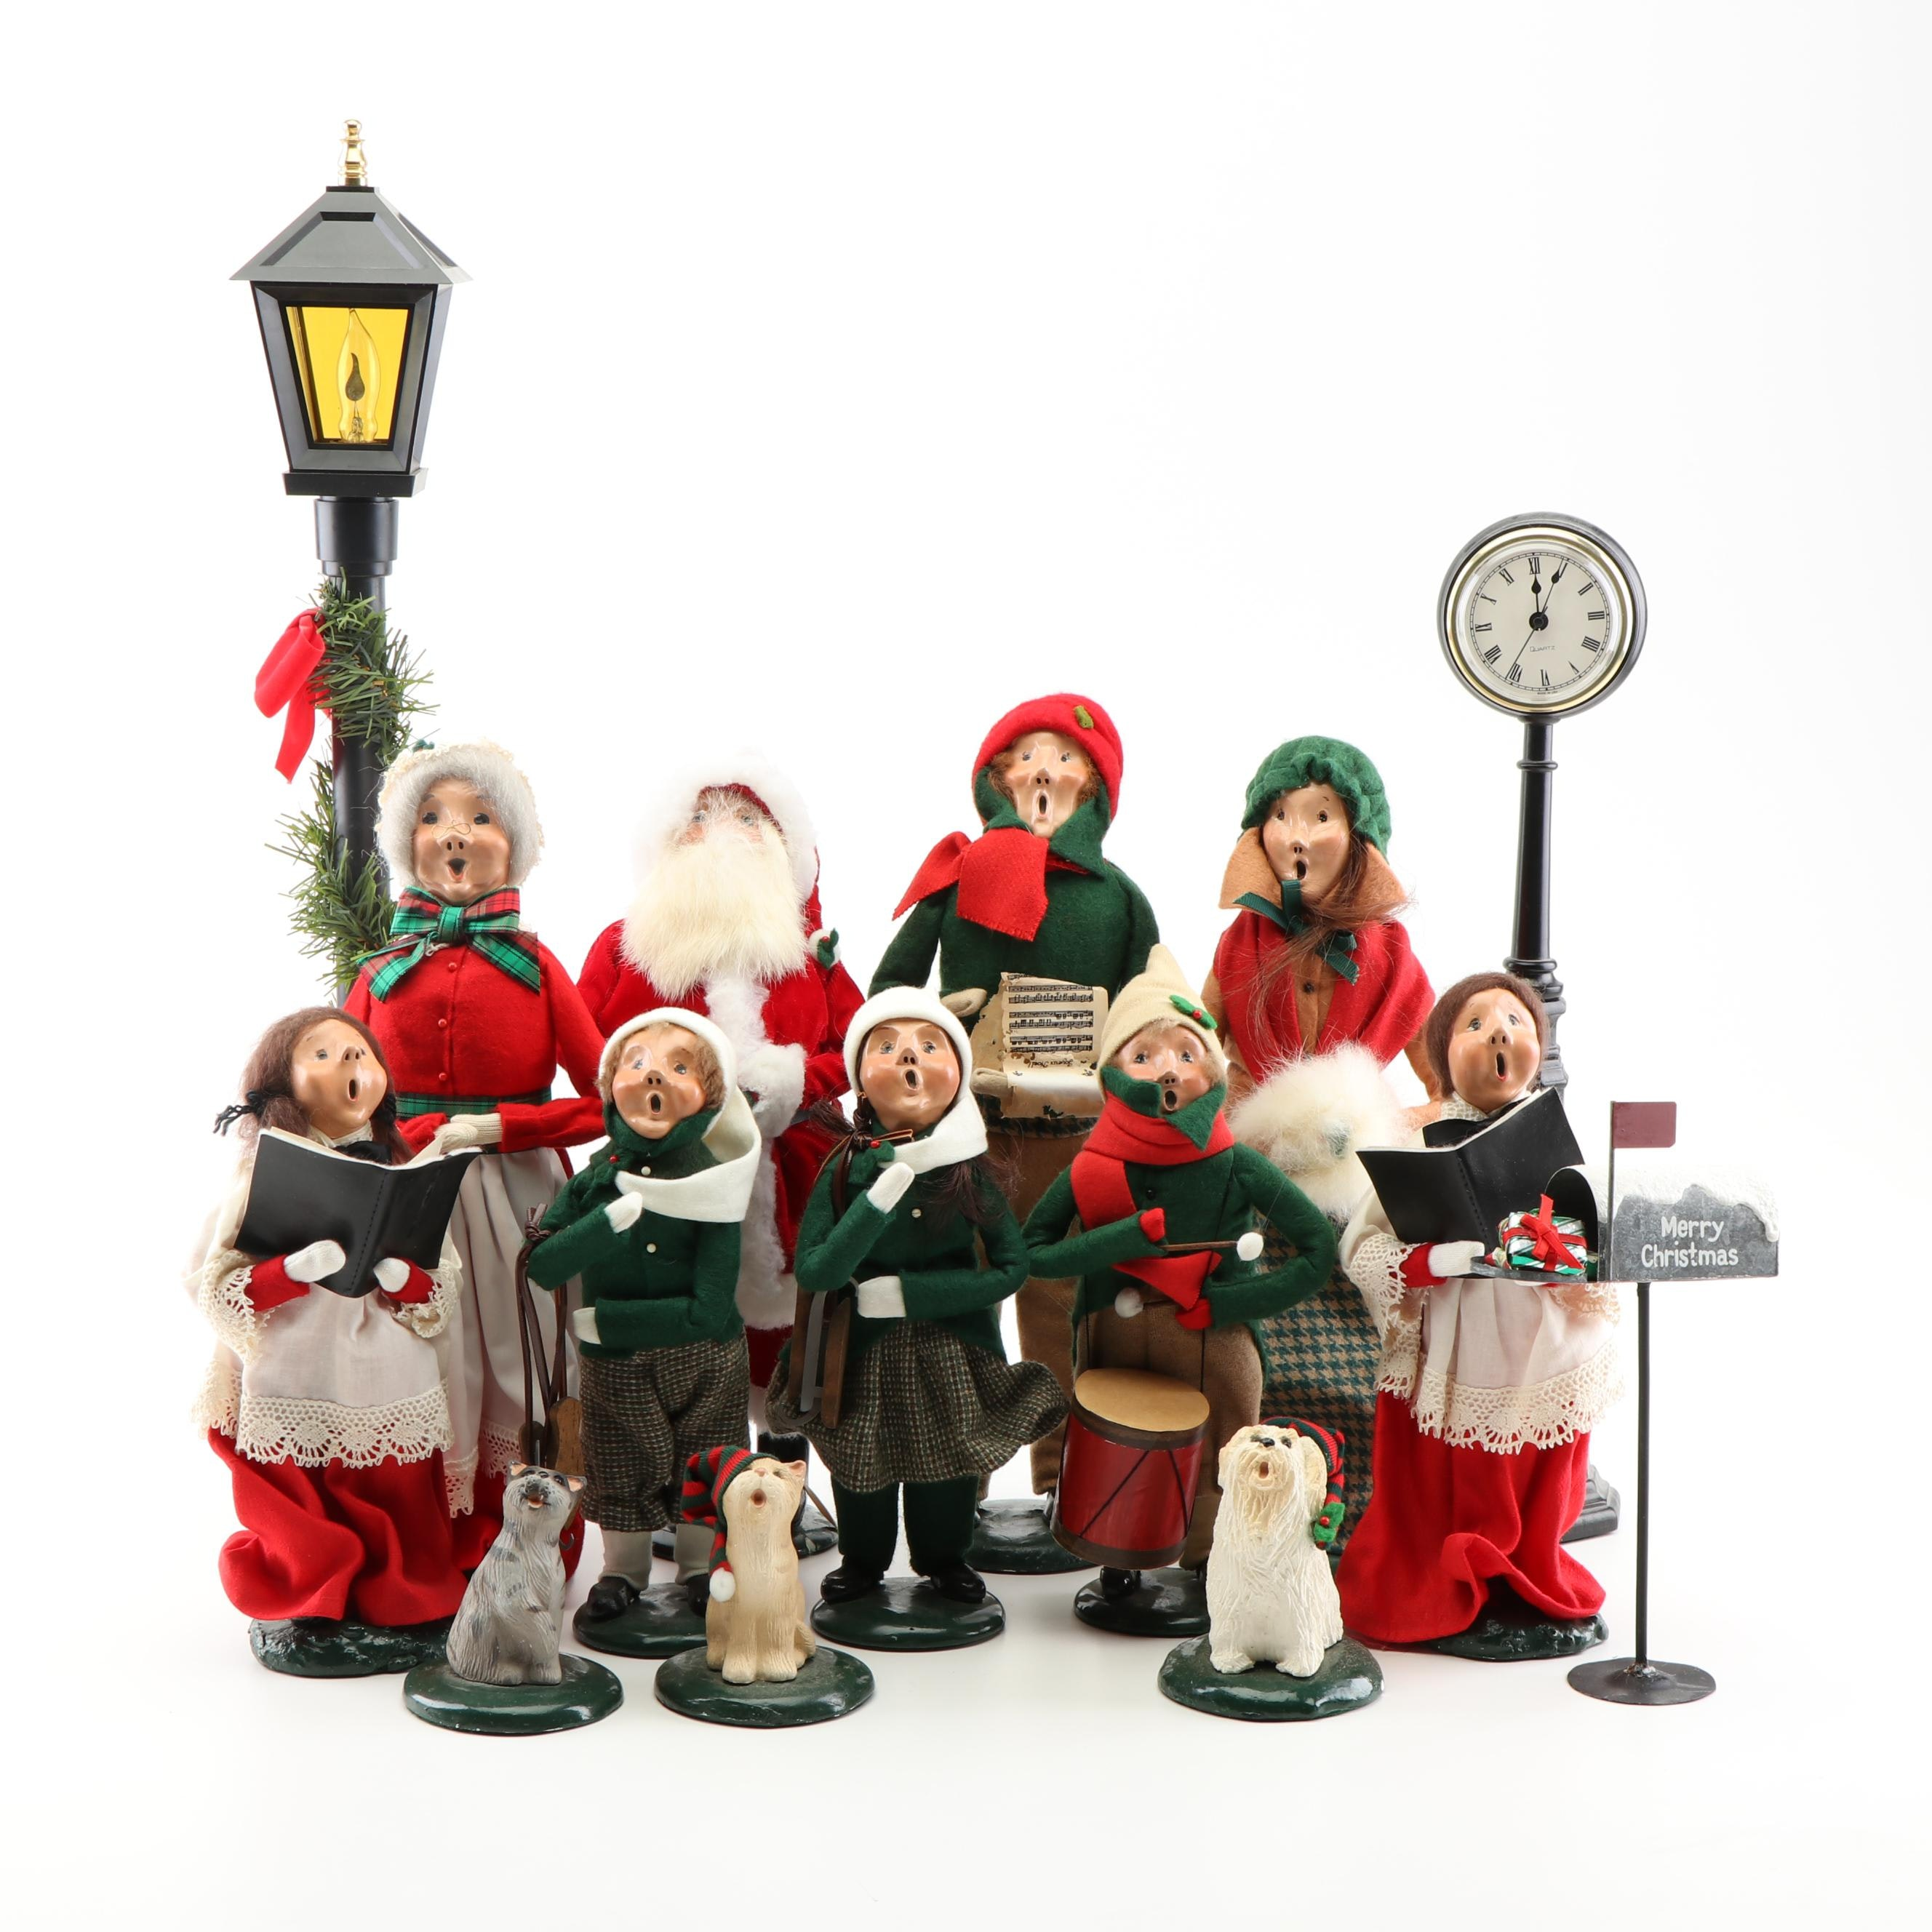 Byers' Choice Christmas Carolers Figurines